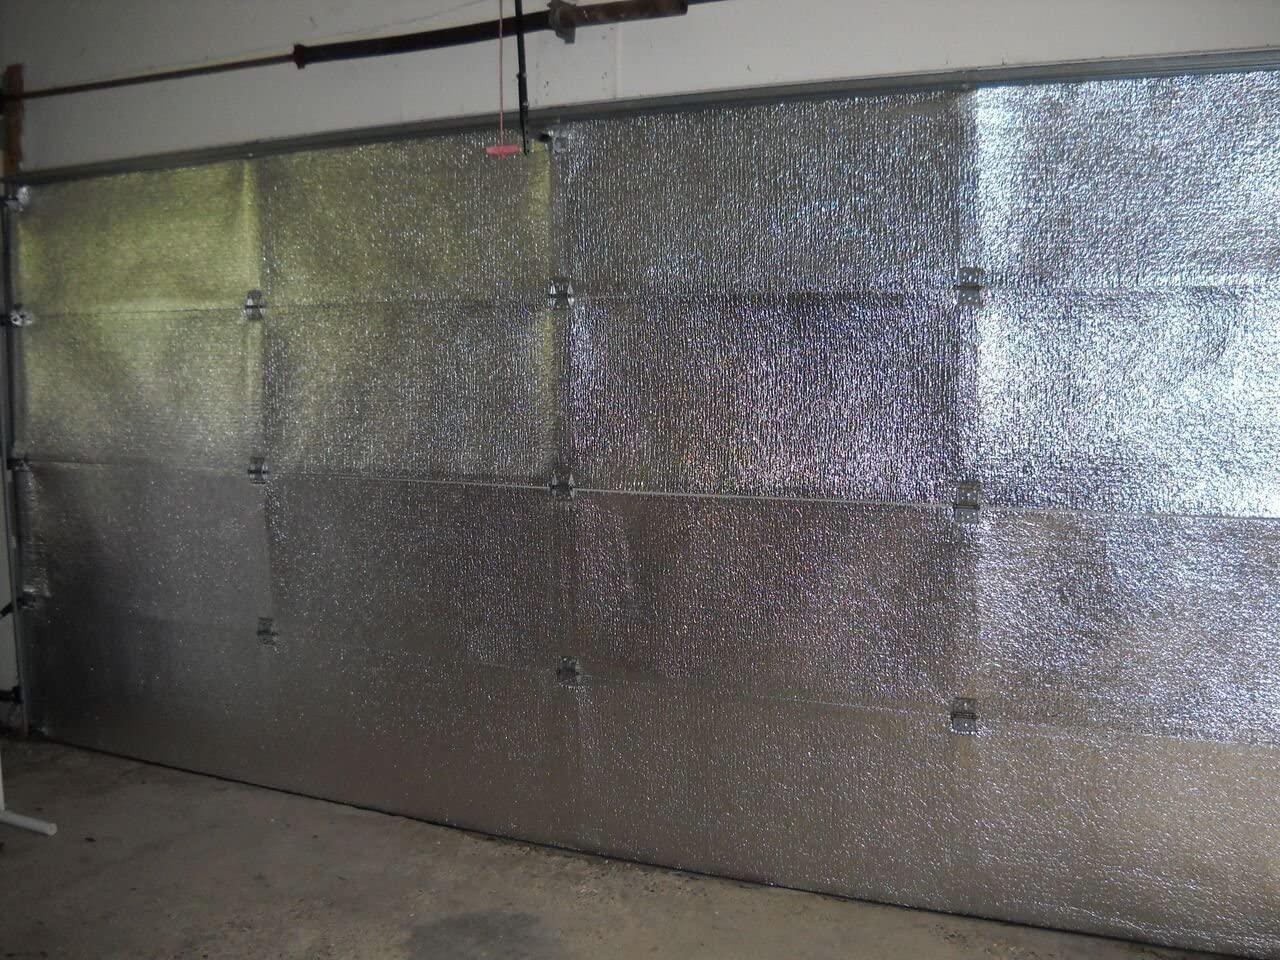 Supershield Reflective Platinum Double Car Garage Door Insulation Foam Core Kit